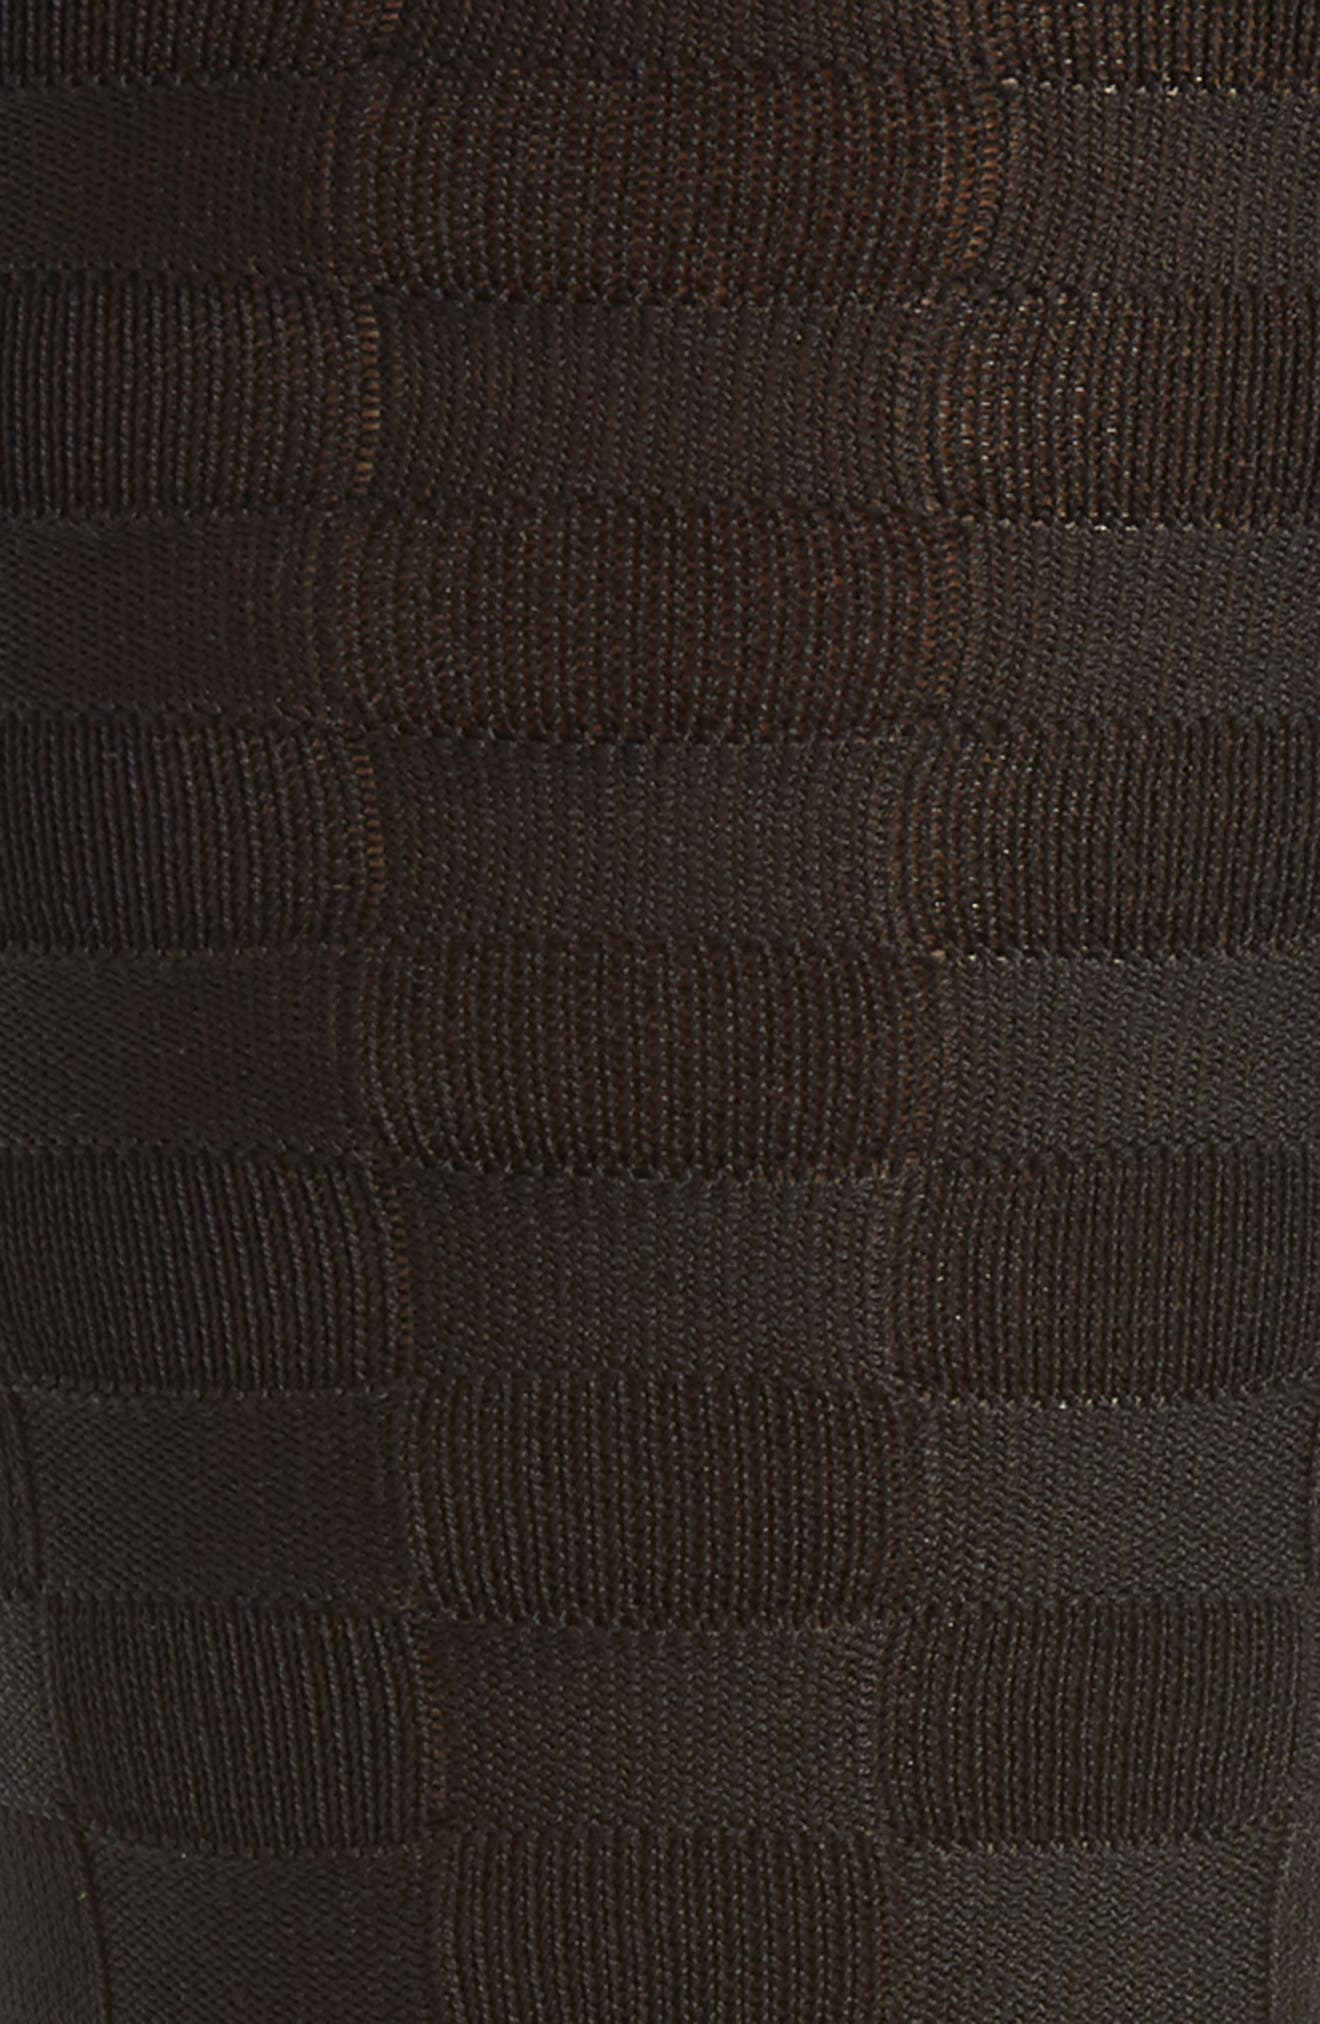 Grid Socks,                             Alternate thumbnail 2, color,                             Black